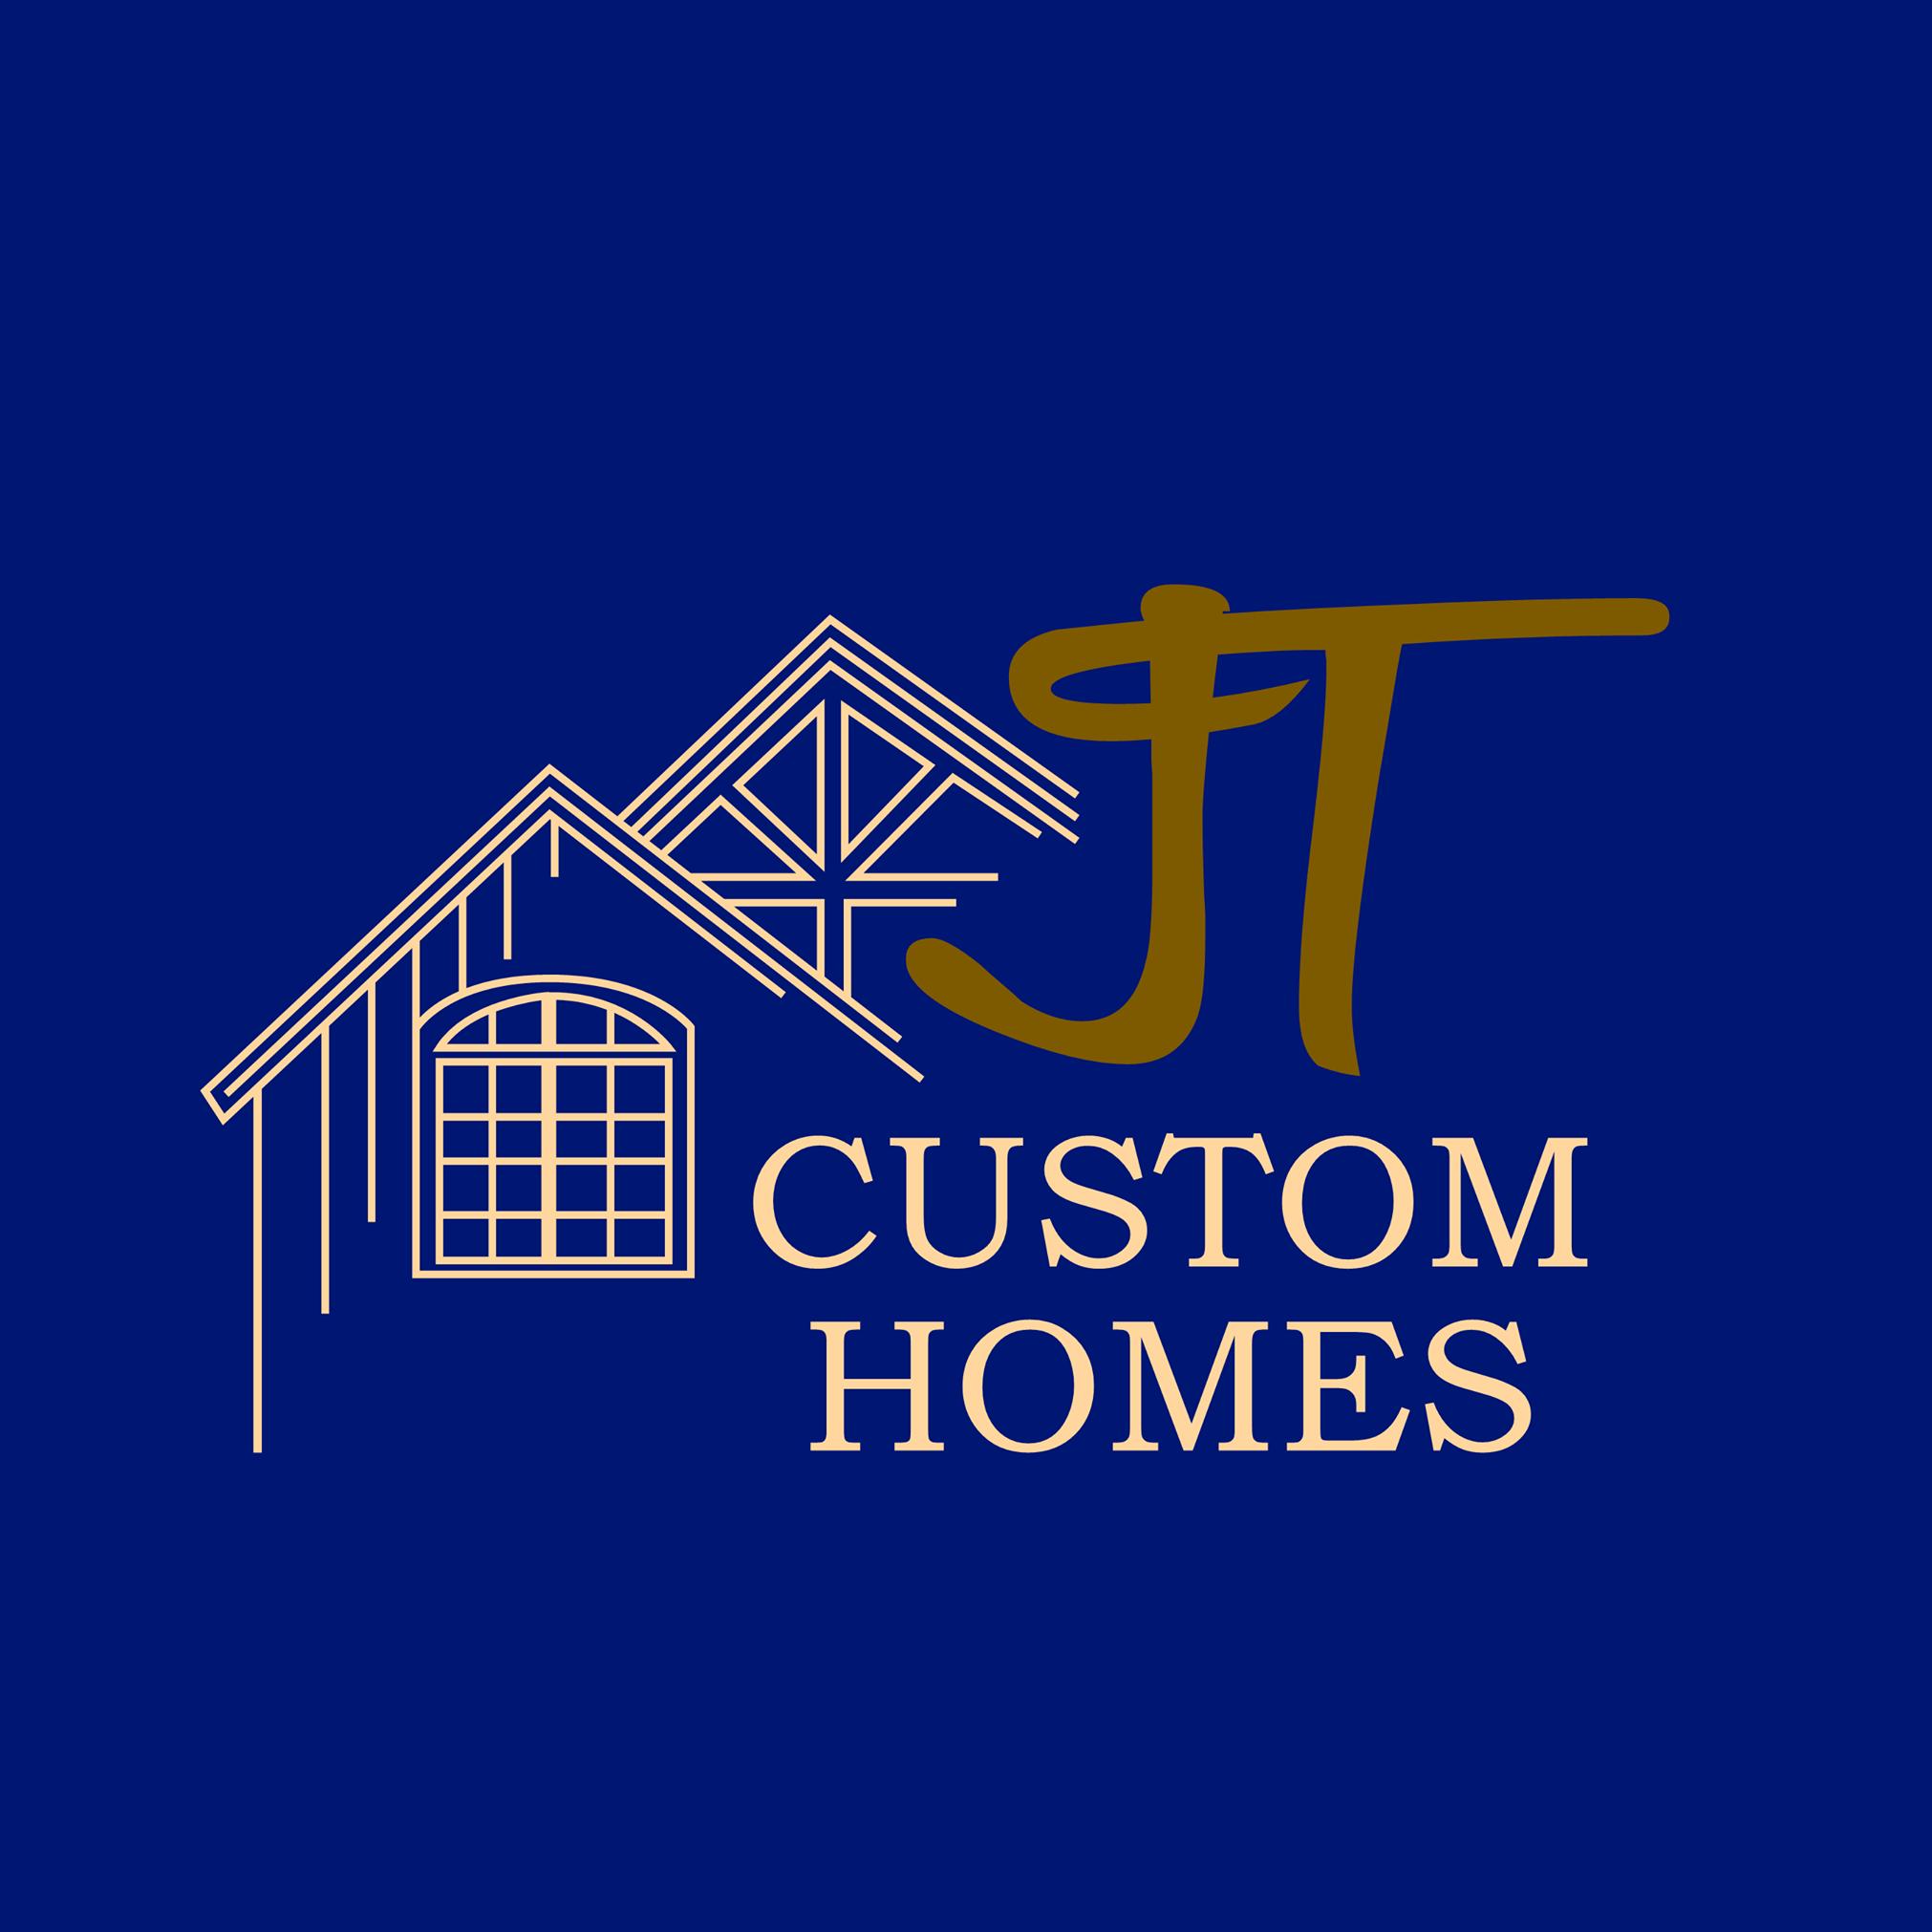 JT Custom Homes image 5